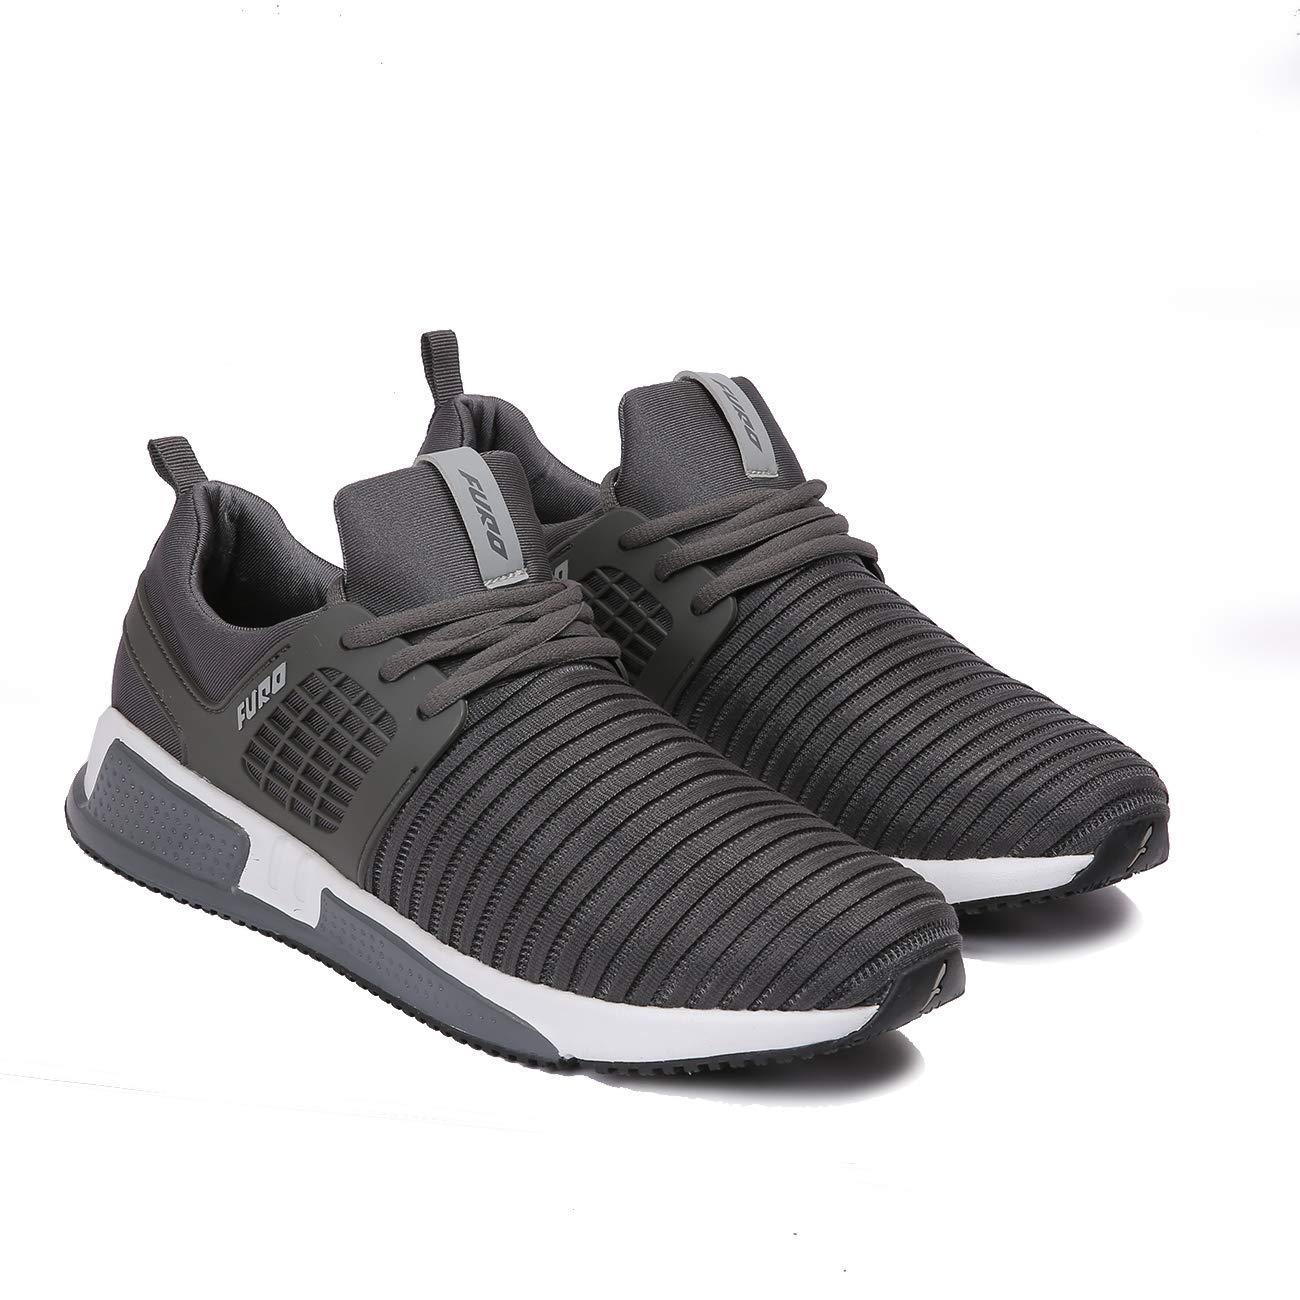 Buy FURO Men's Walking Shoes at Amazon.in